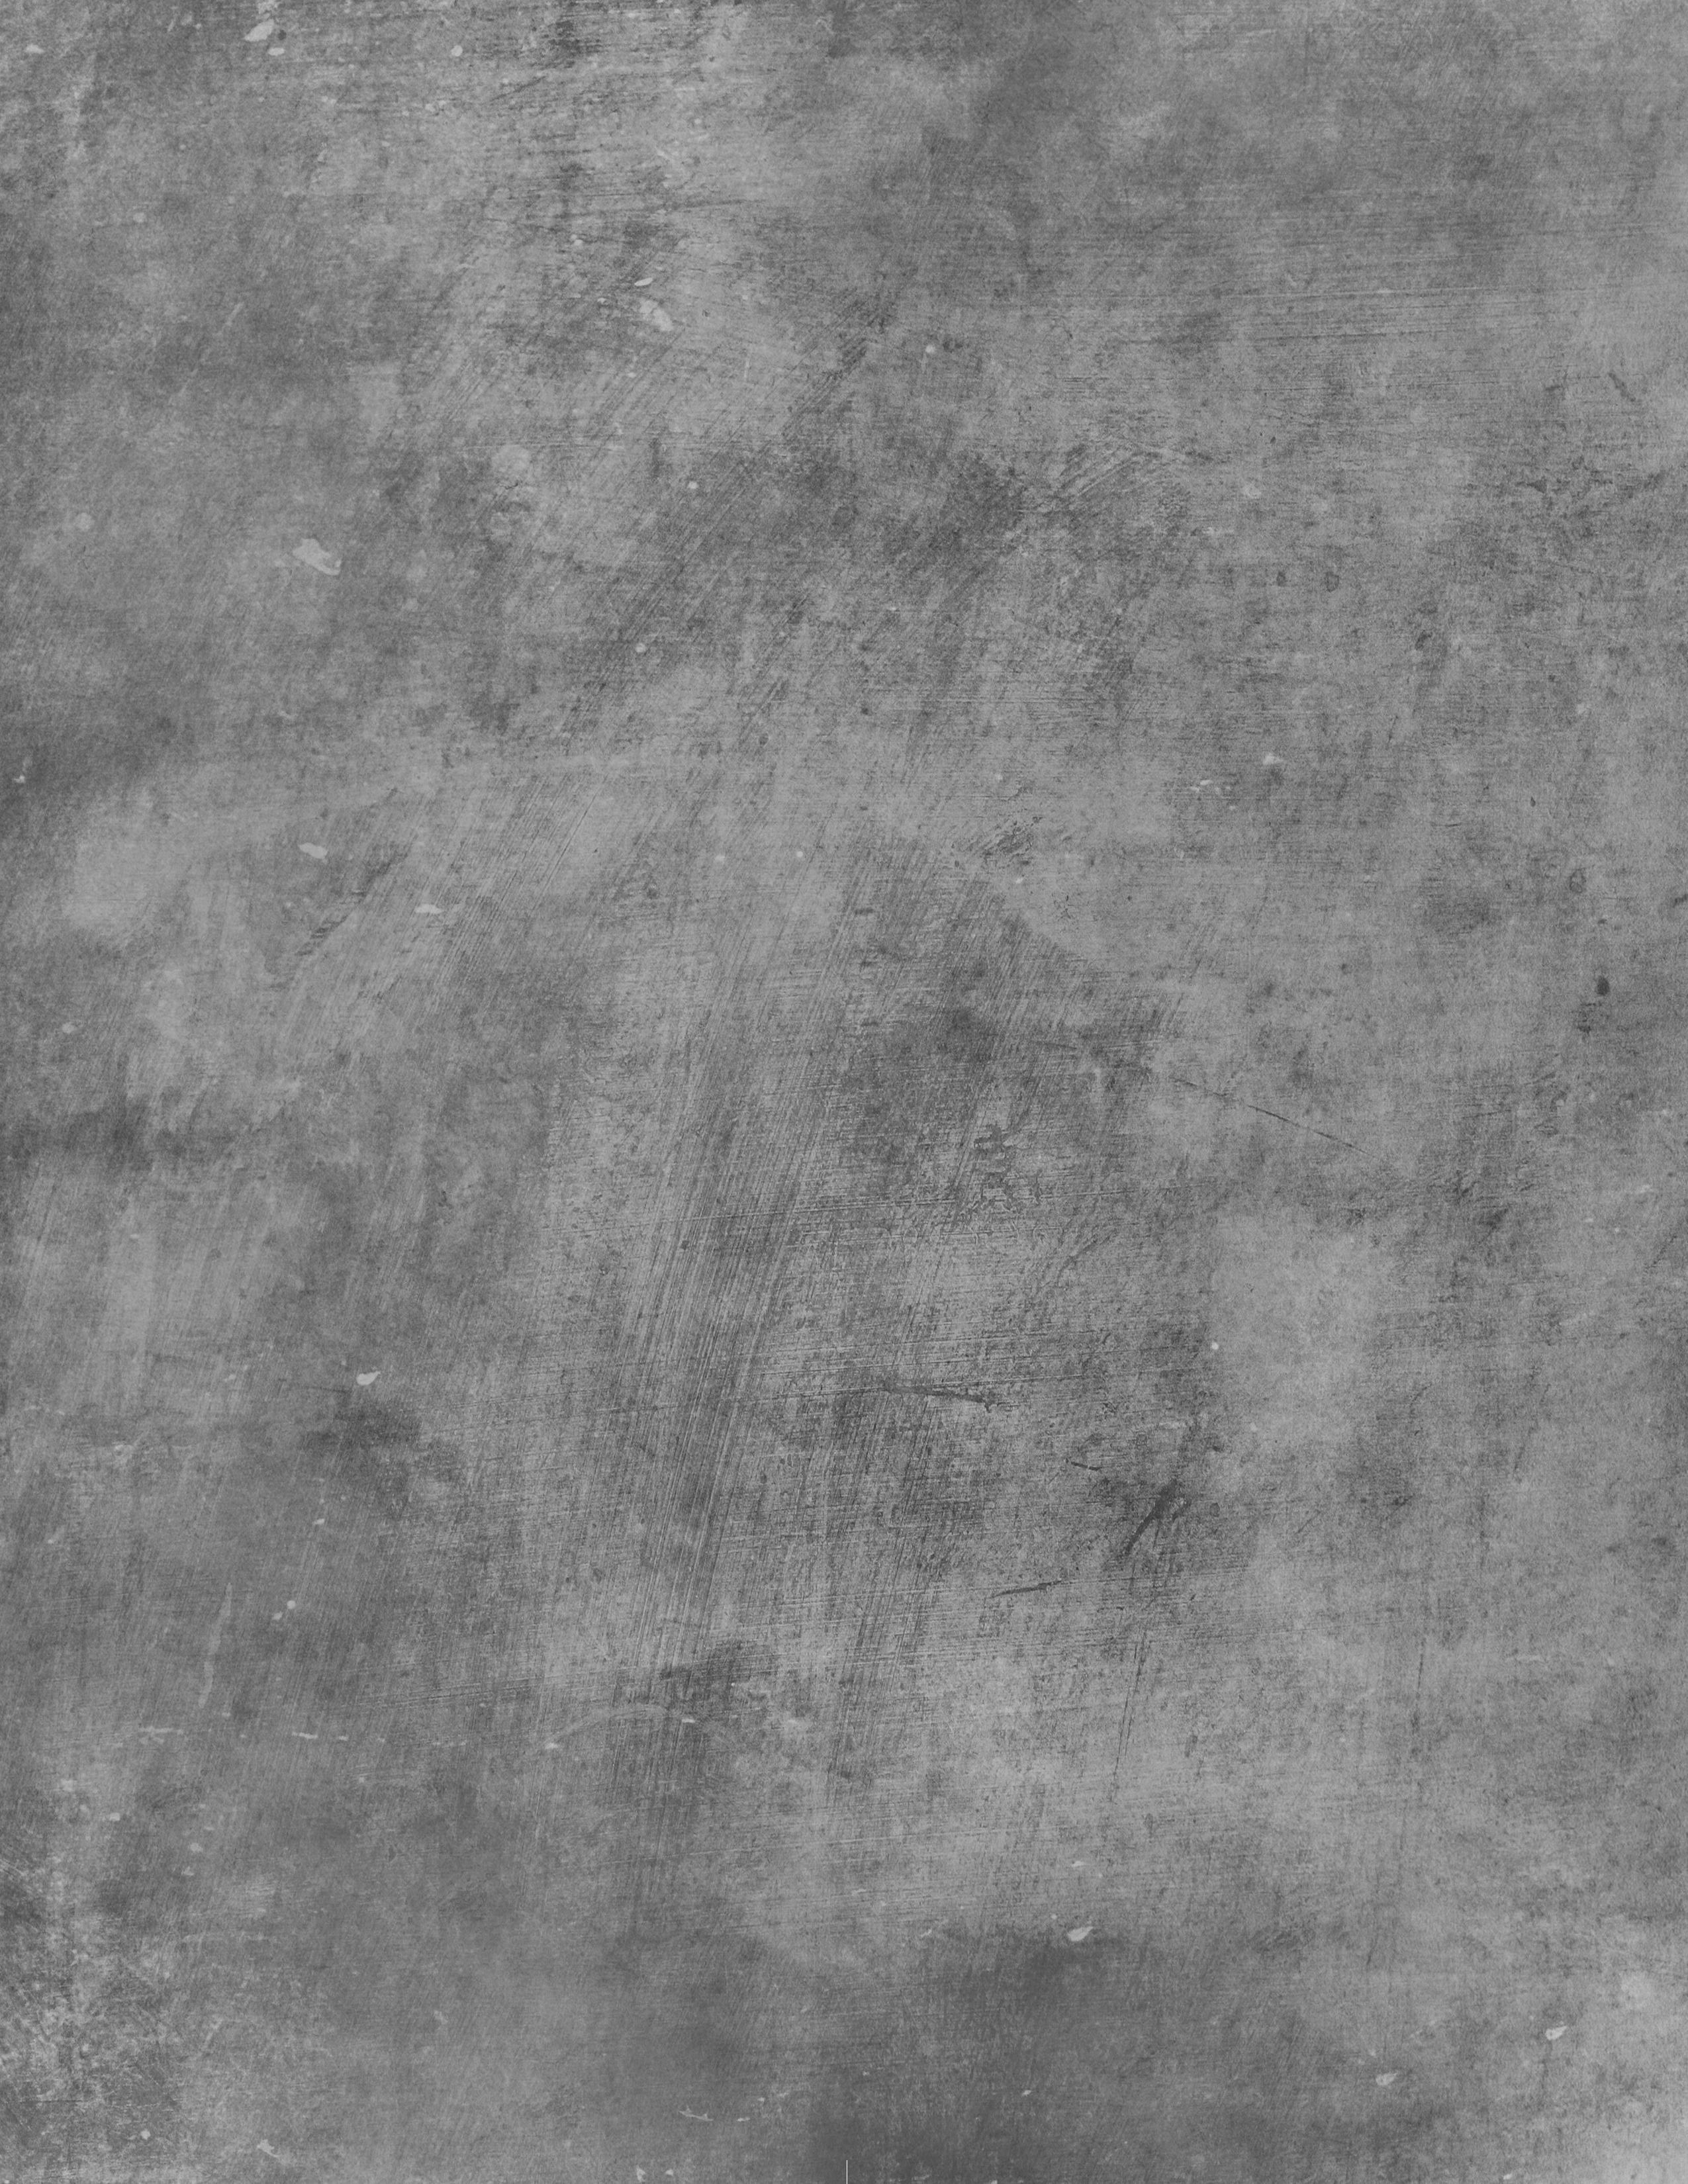 Transparent Pattern Overlay